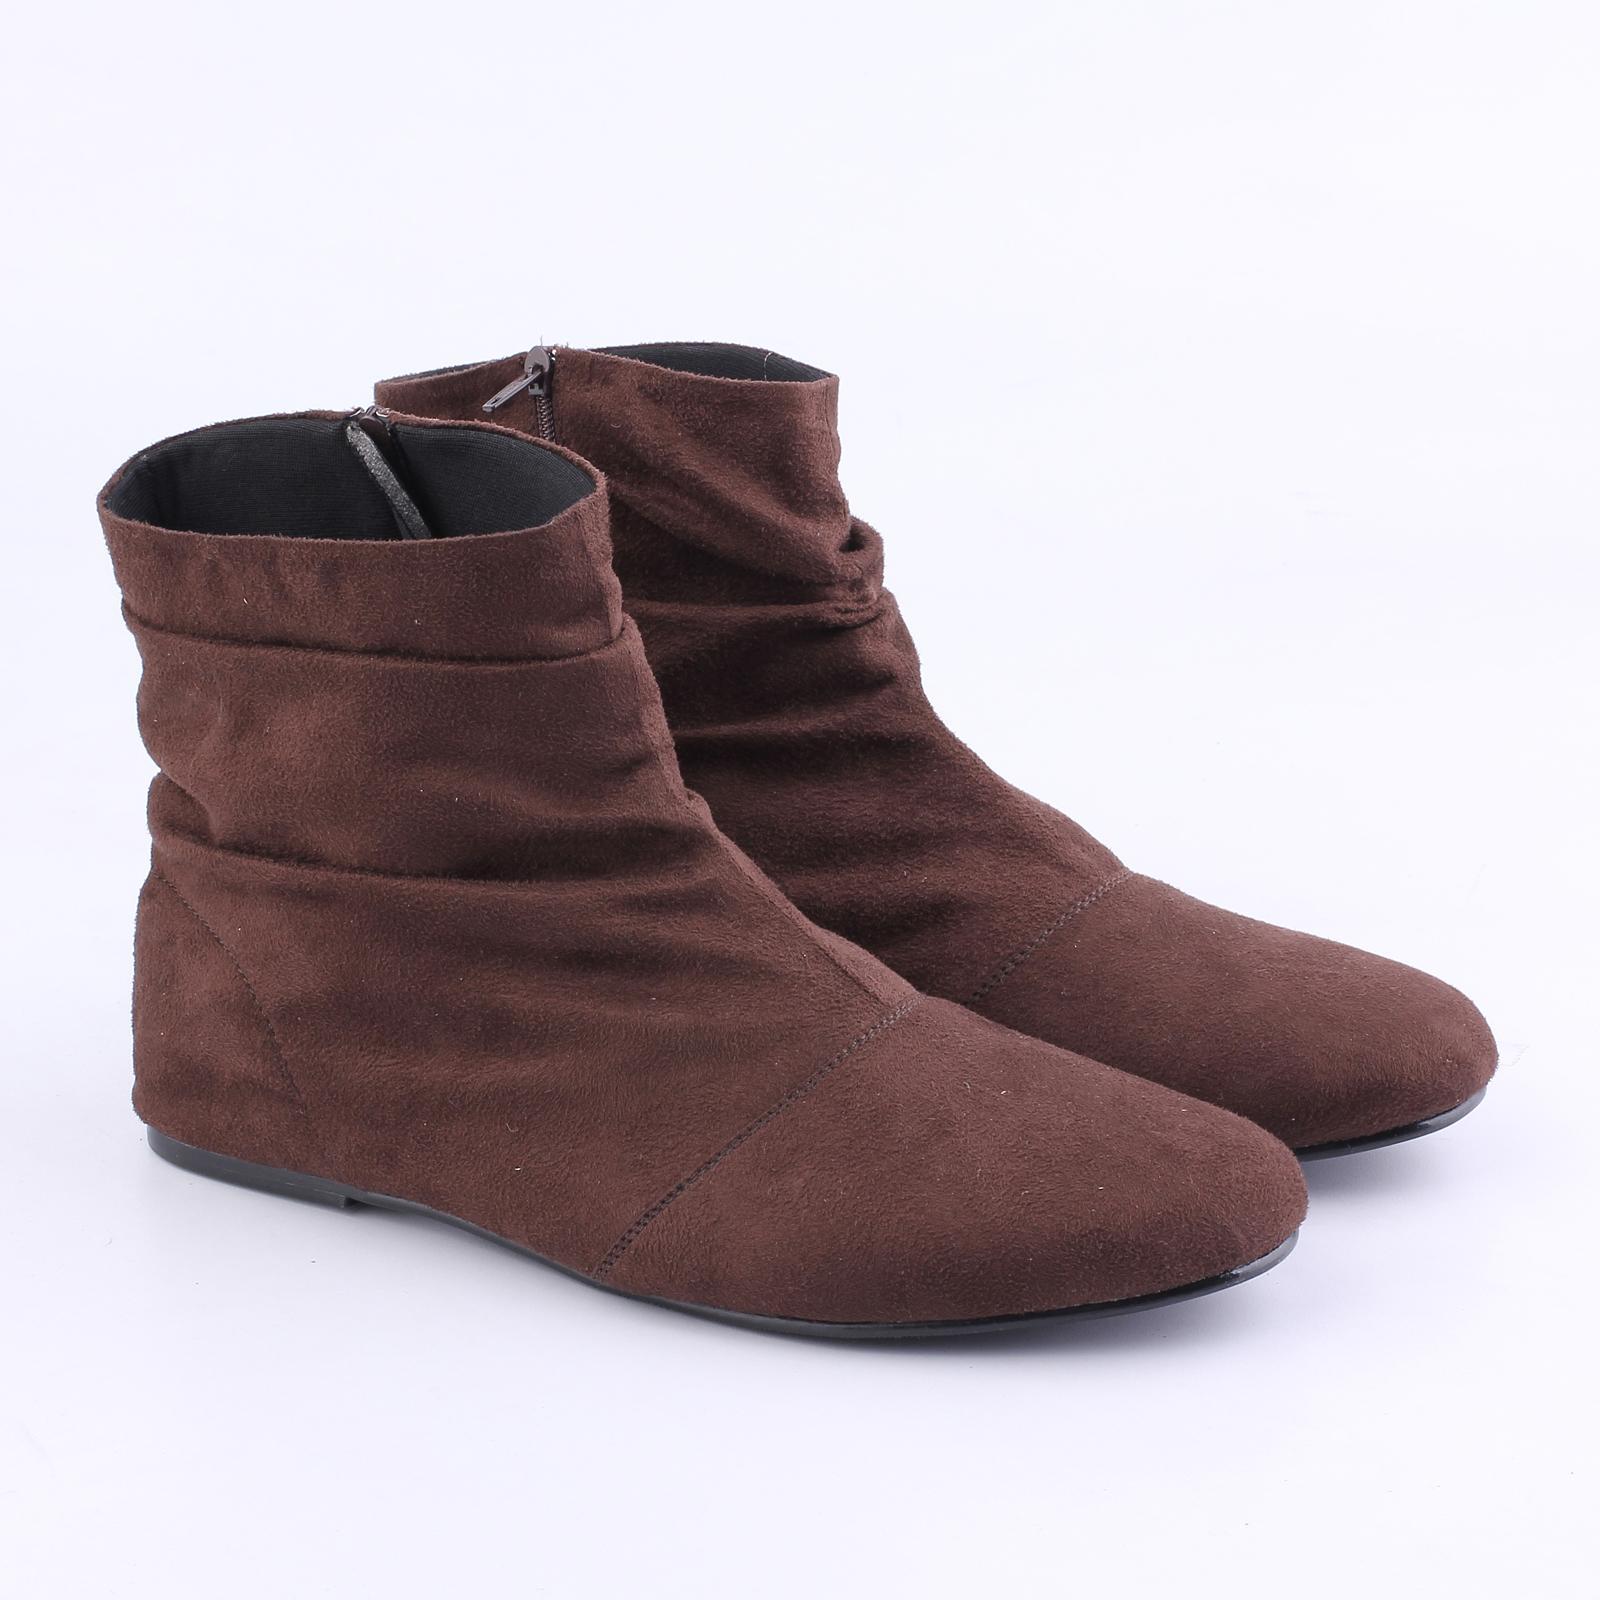 Catenzo - Sepatu Boots Wanita - YE 091 - Brown - Terbaru